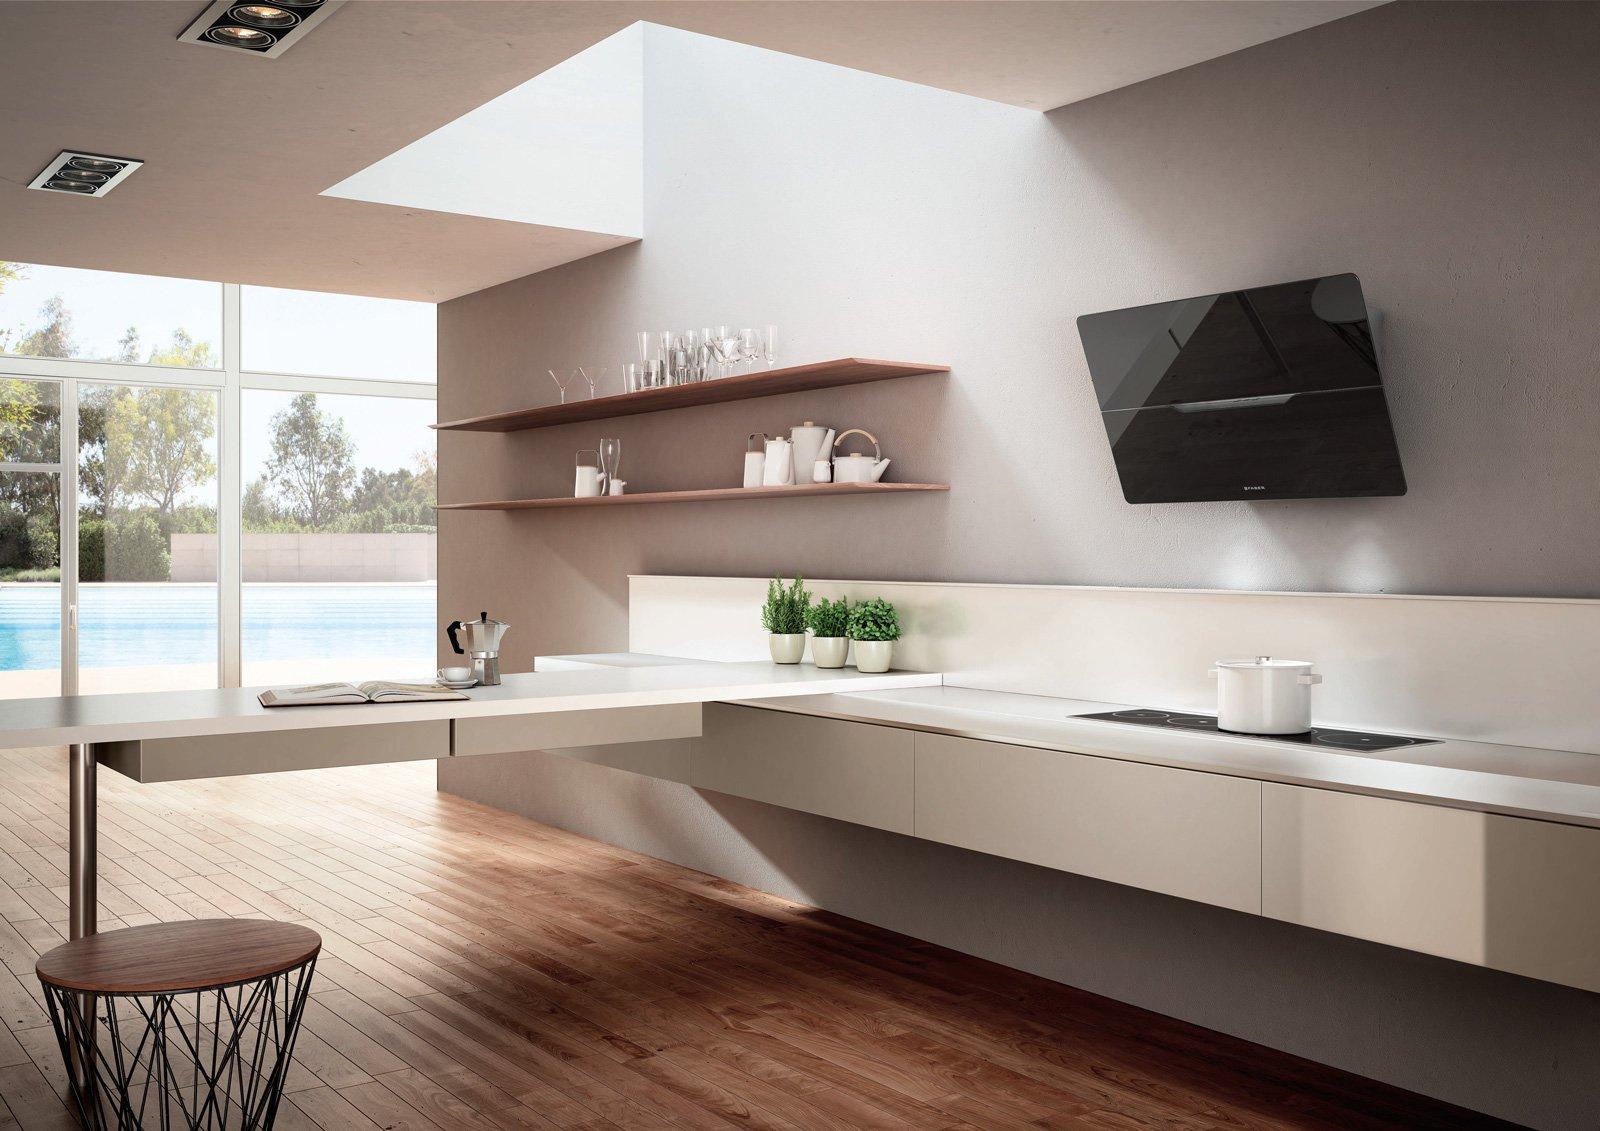 Tubo Per Cappa Cucina Design cappe silenziose per la cucina - cose di casa